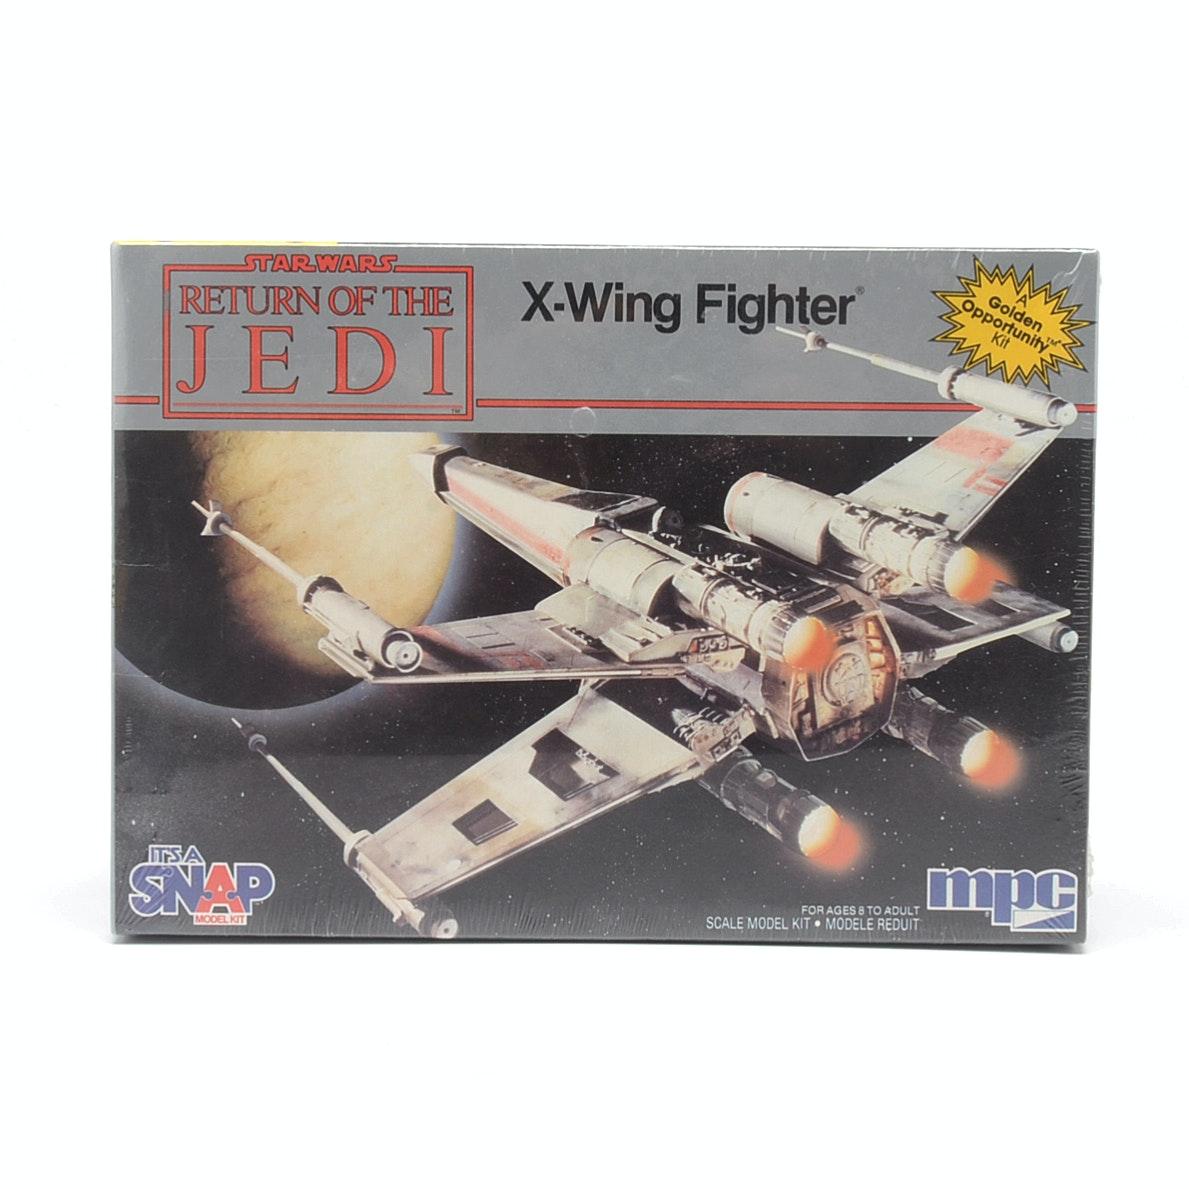 1983 Star Wars X-Wing Fighter Model Kit